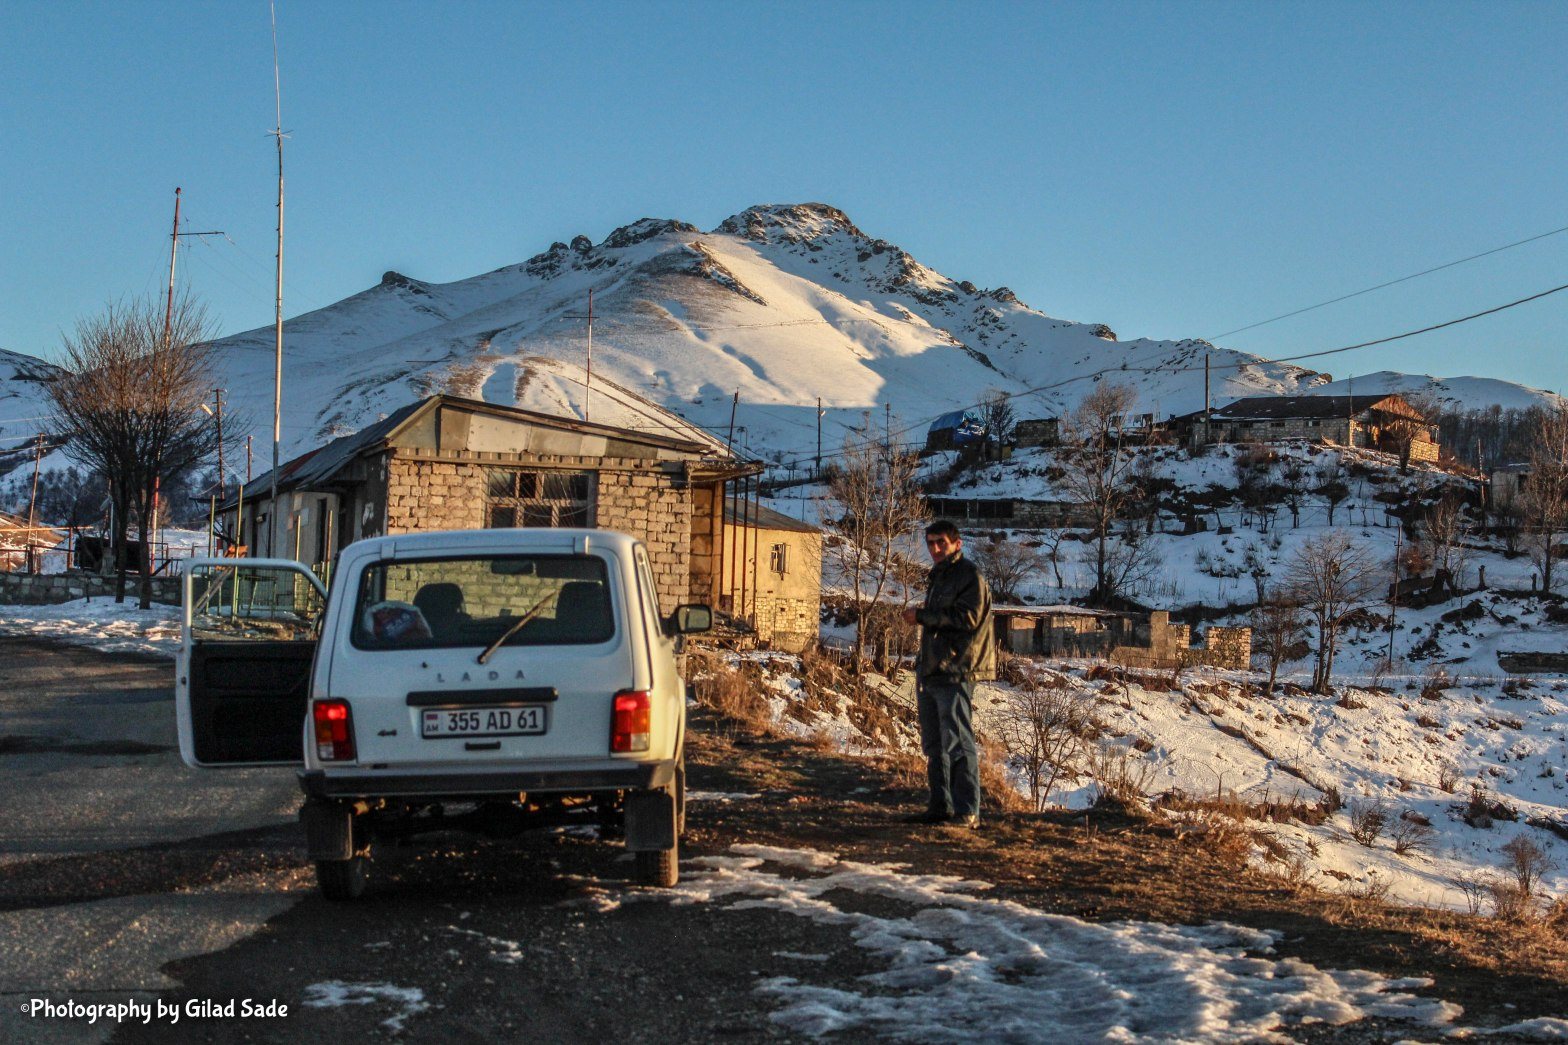 Winter travel in Nagorno Karabakh